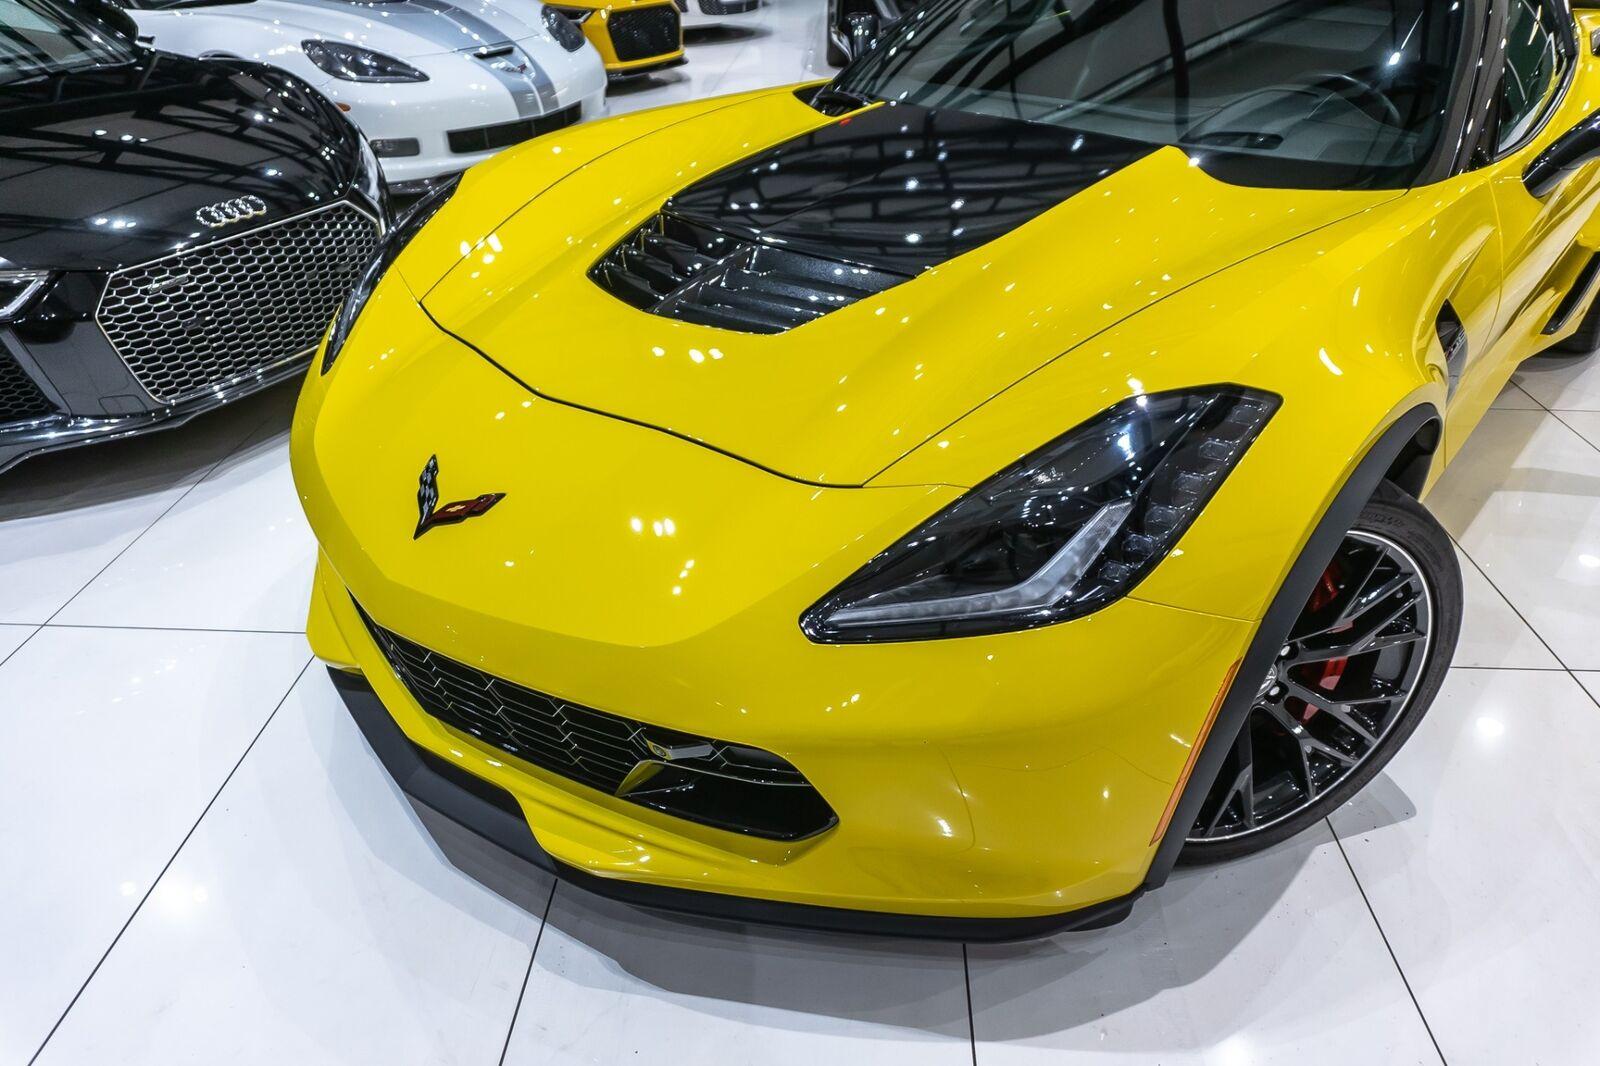 2016 Yellow Chevrolet Corvette Coupe 2LZ   C7 Corvette Photo 5